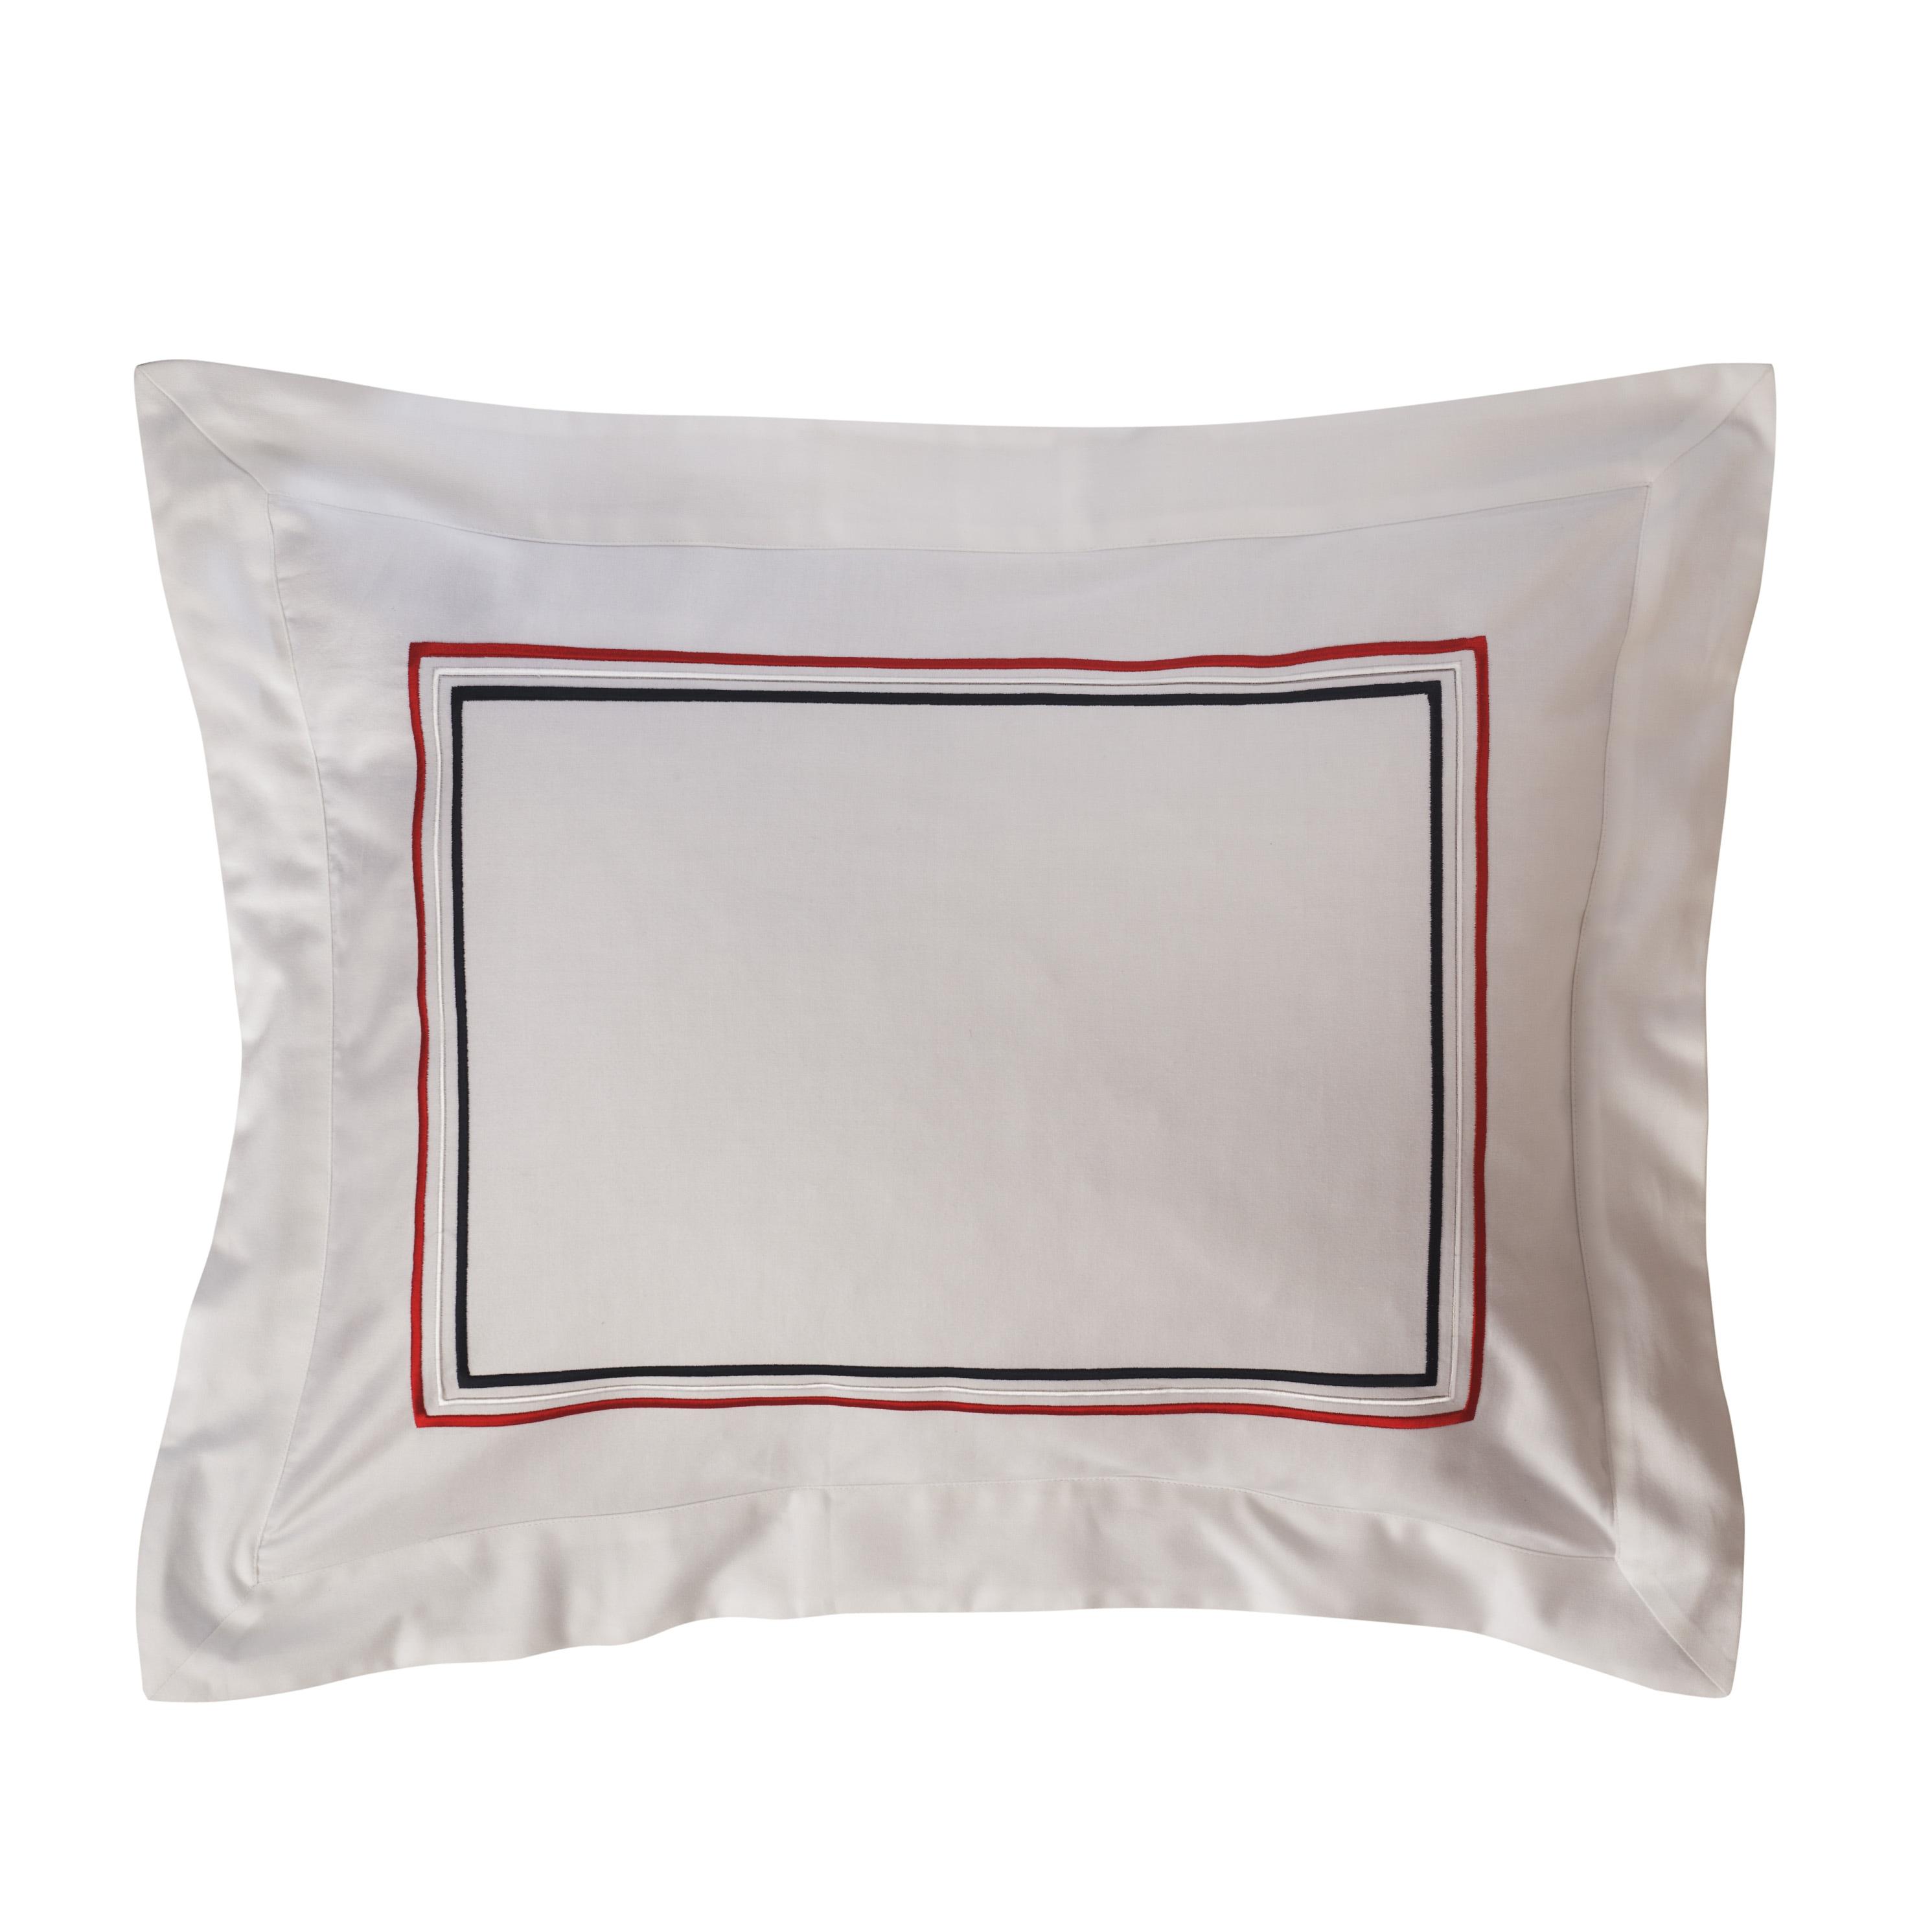 Roxbury Park Patriot Baratto Filled Decorative Pillow